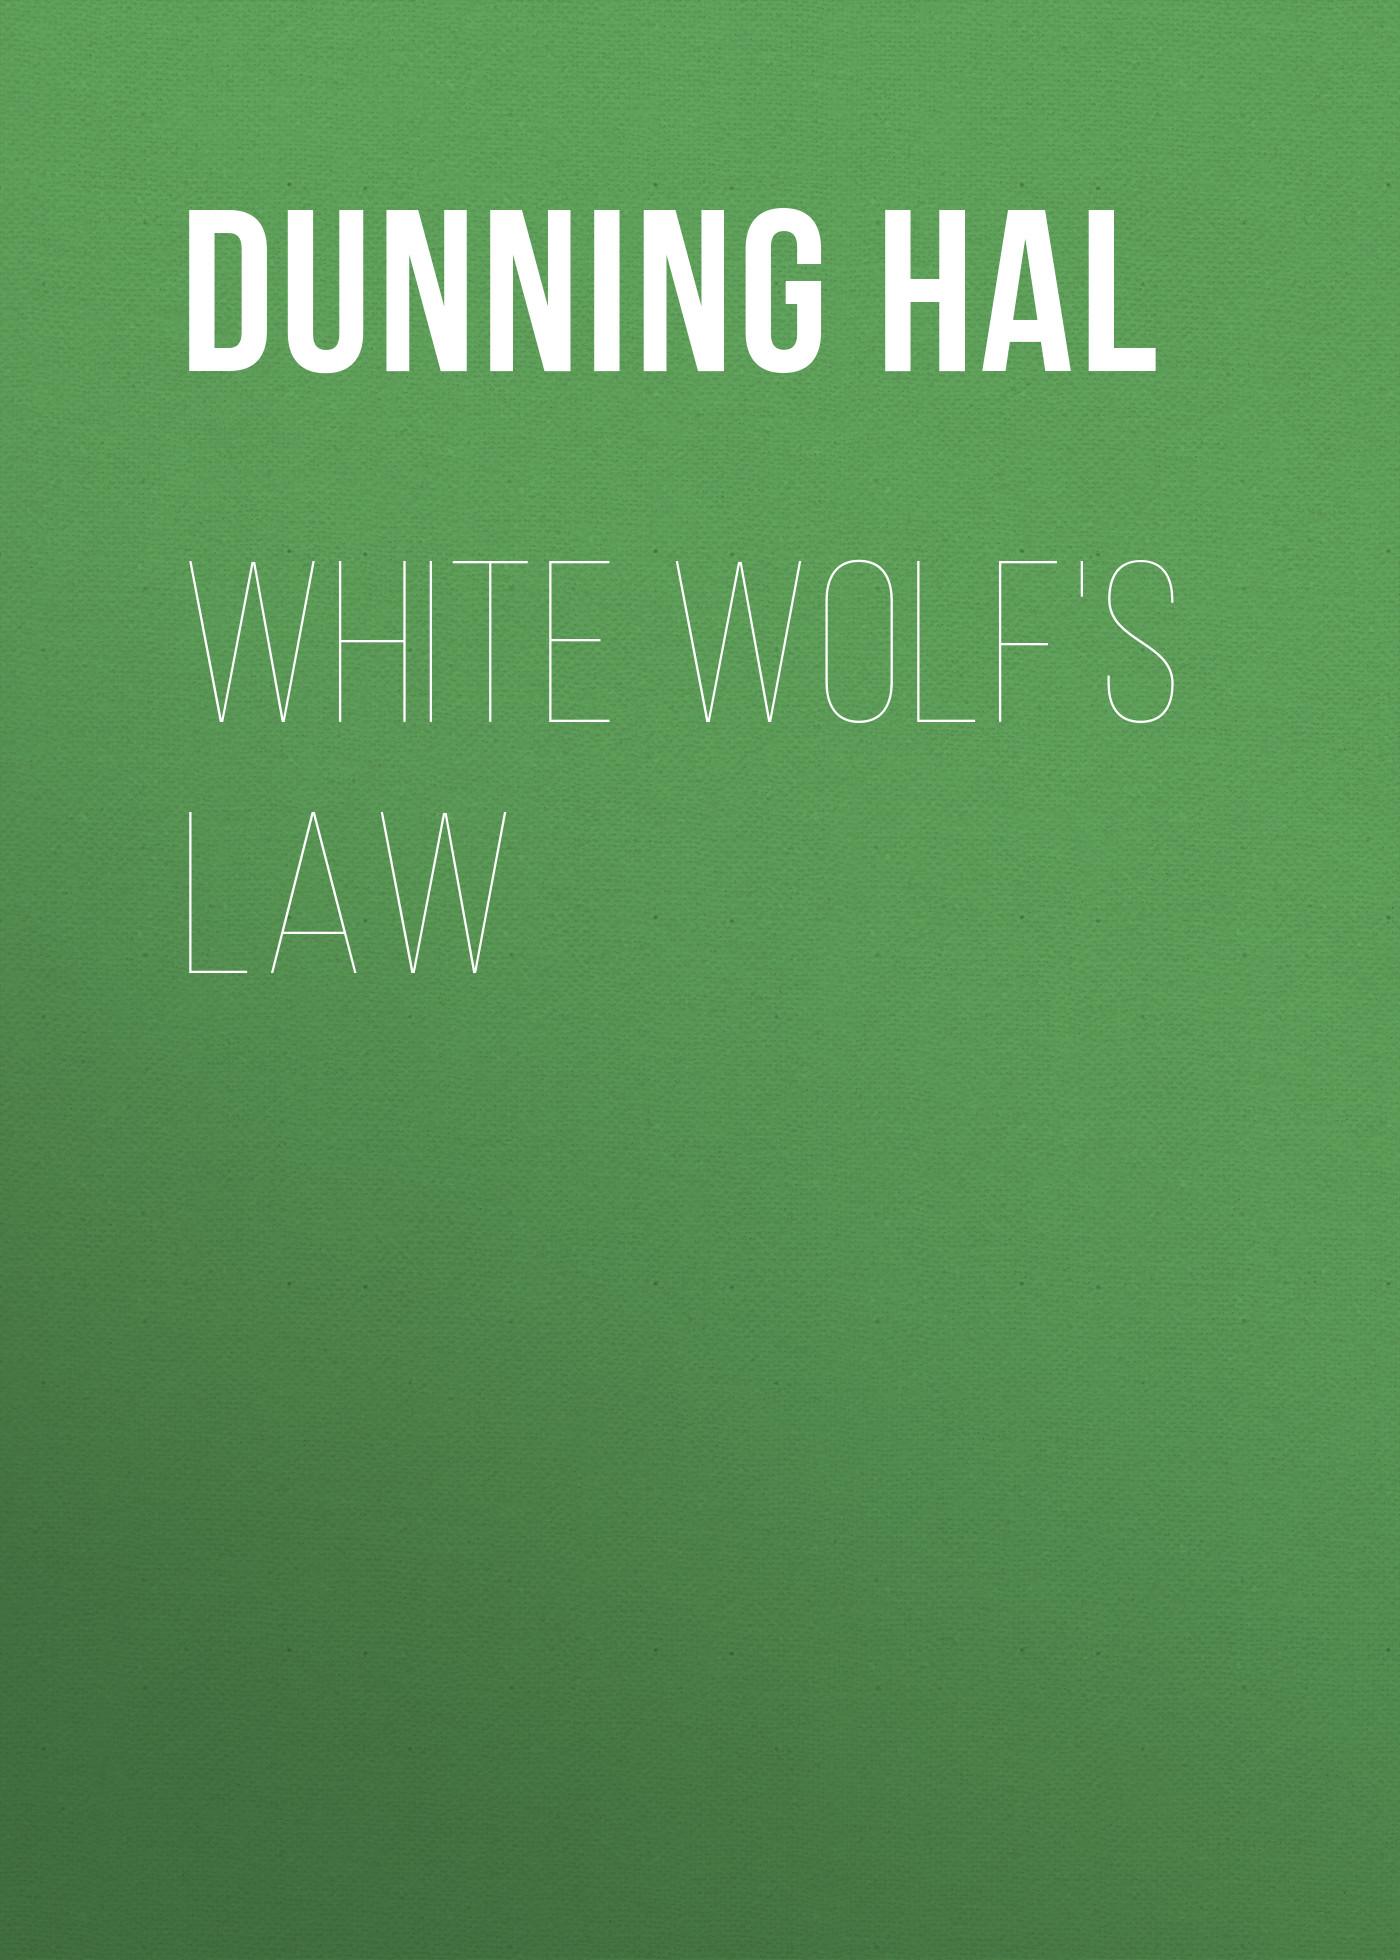 Dunning Hal White Wolf's Law цены онлайн